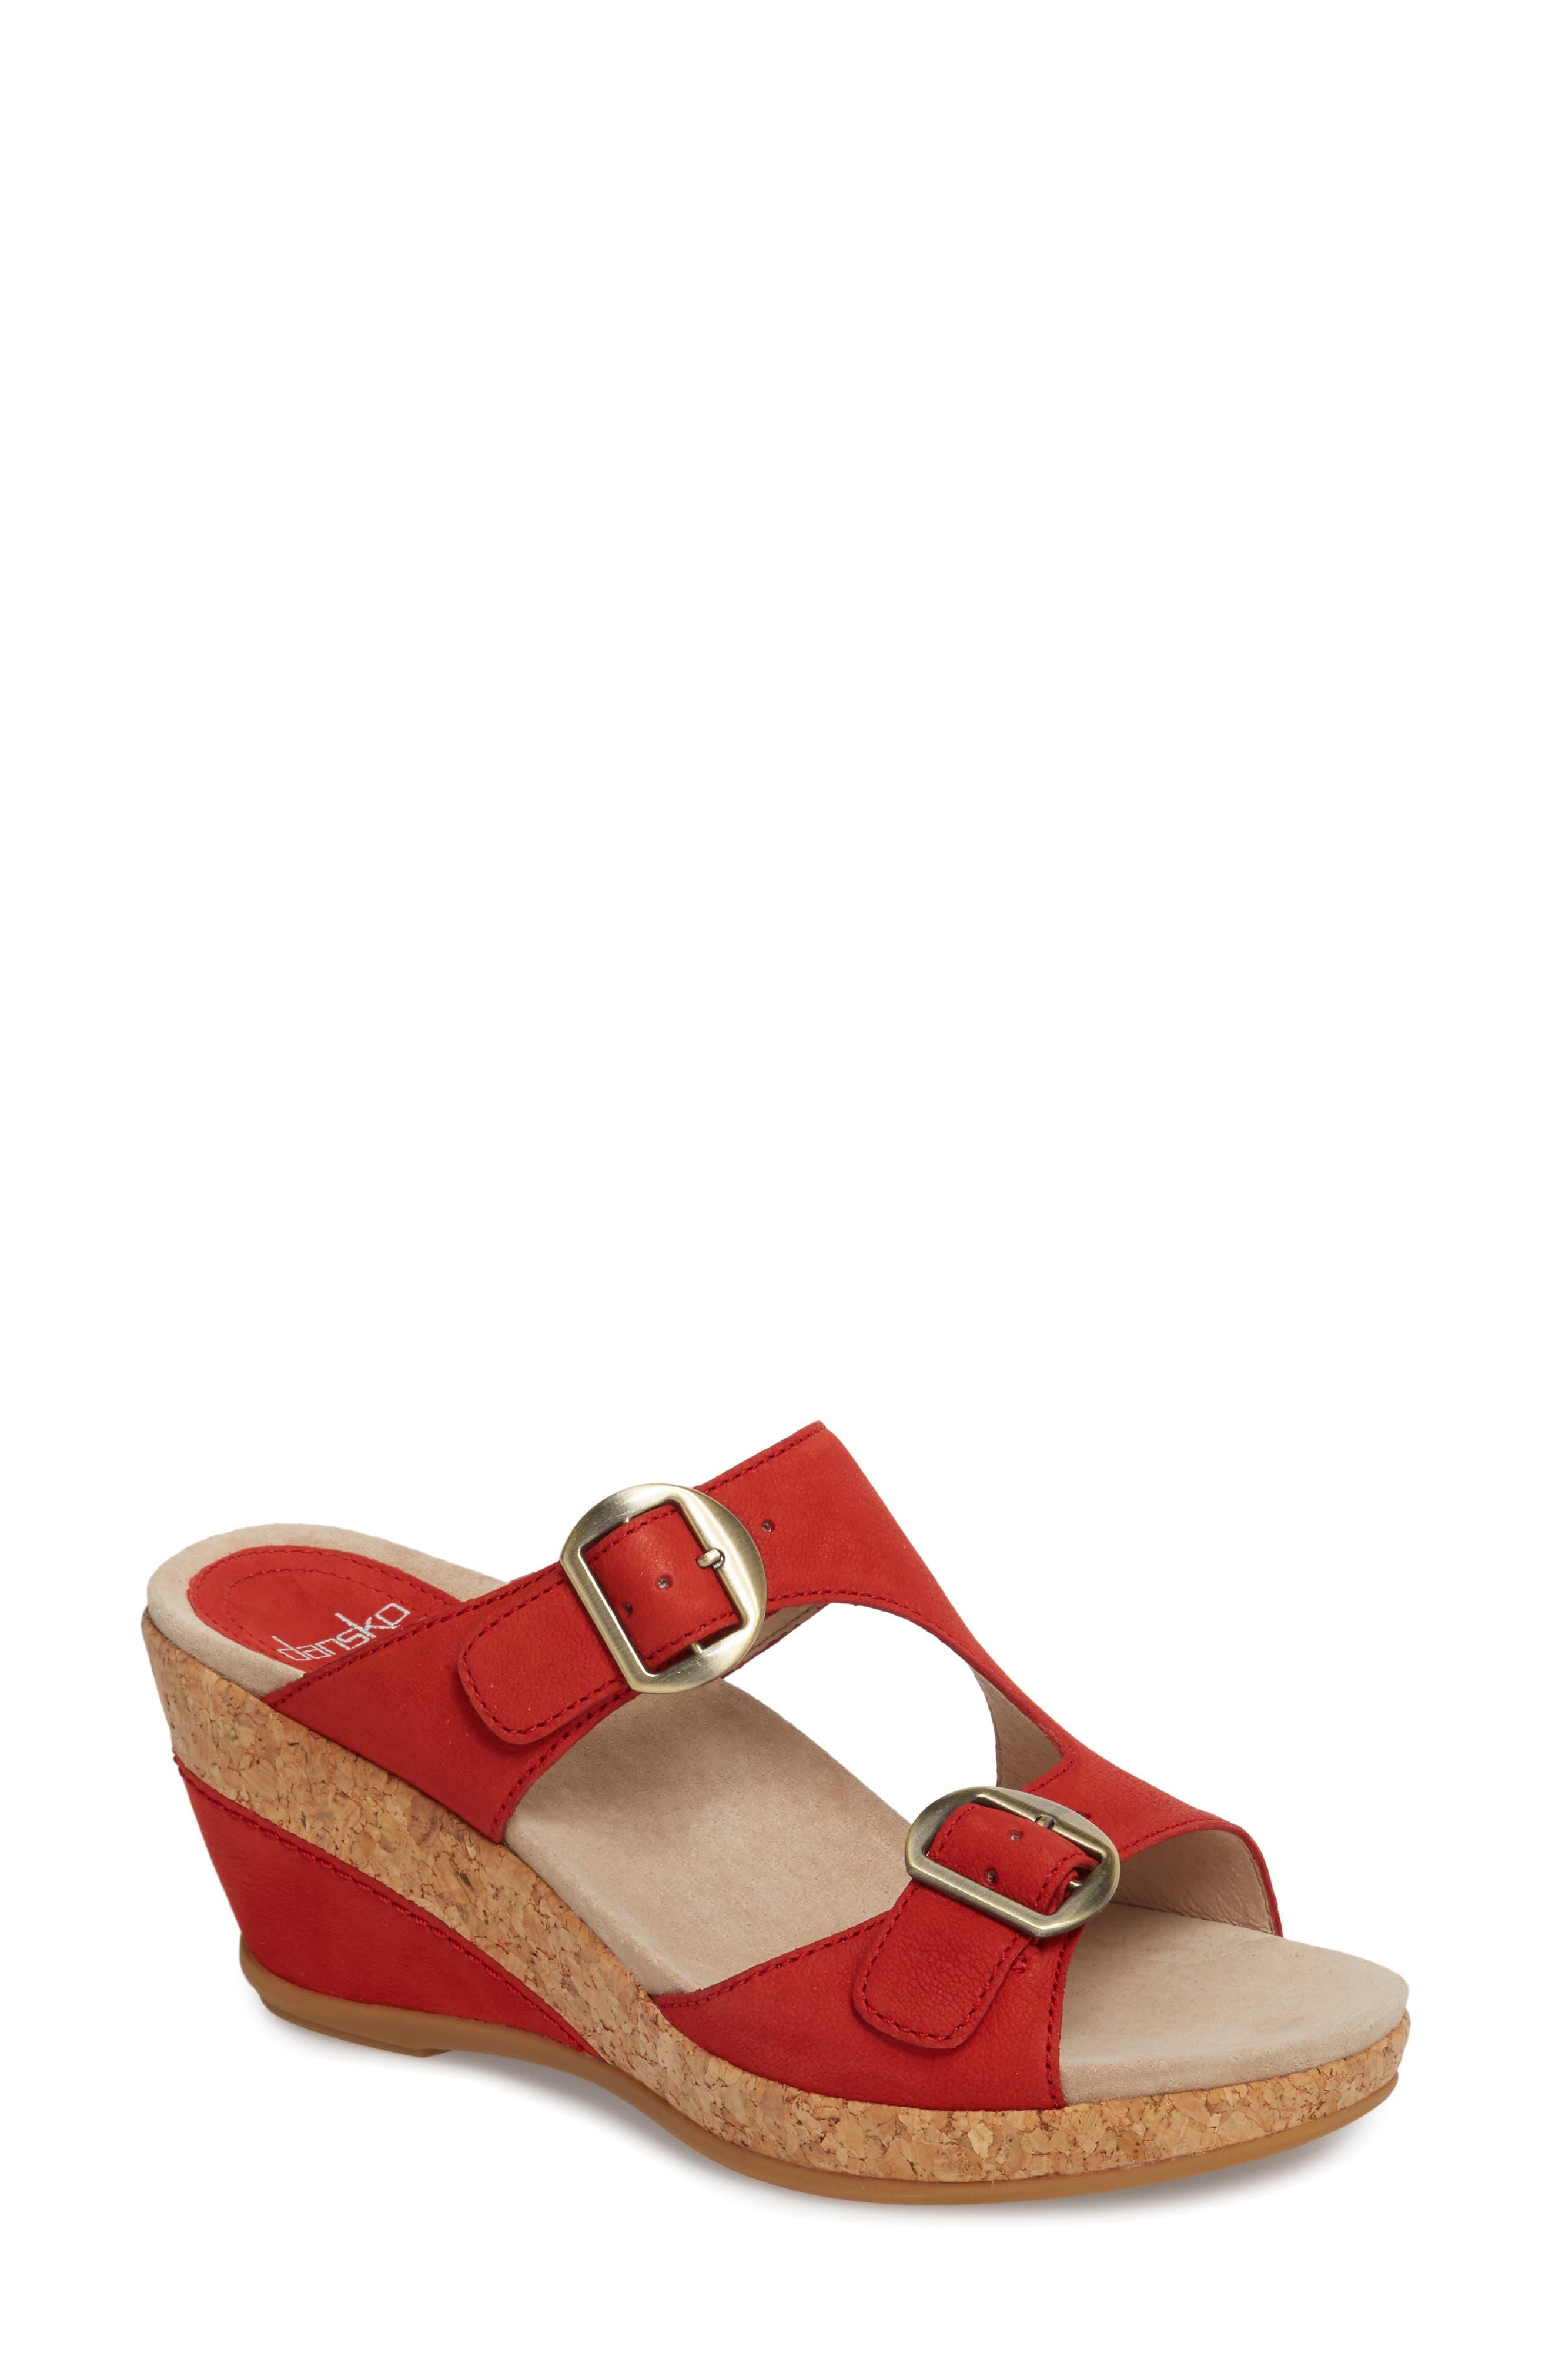 Carla Wedge Slide Sandal,                         Main,                         color, Tomato Milled Nubuck Leather